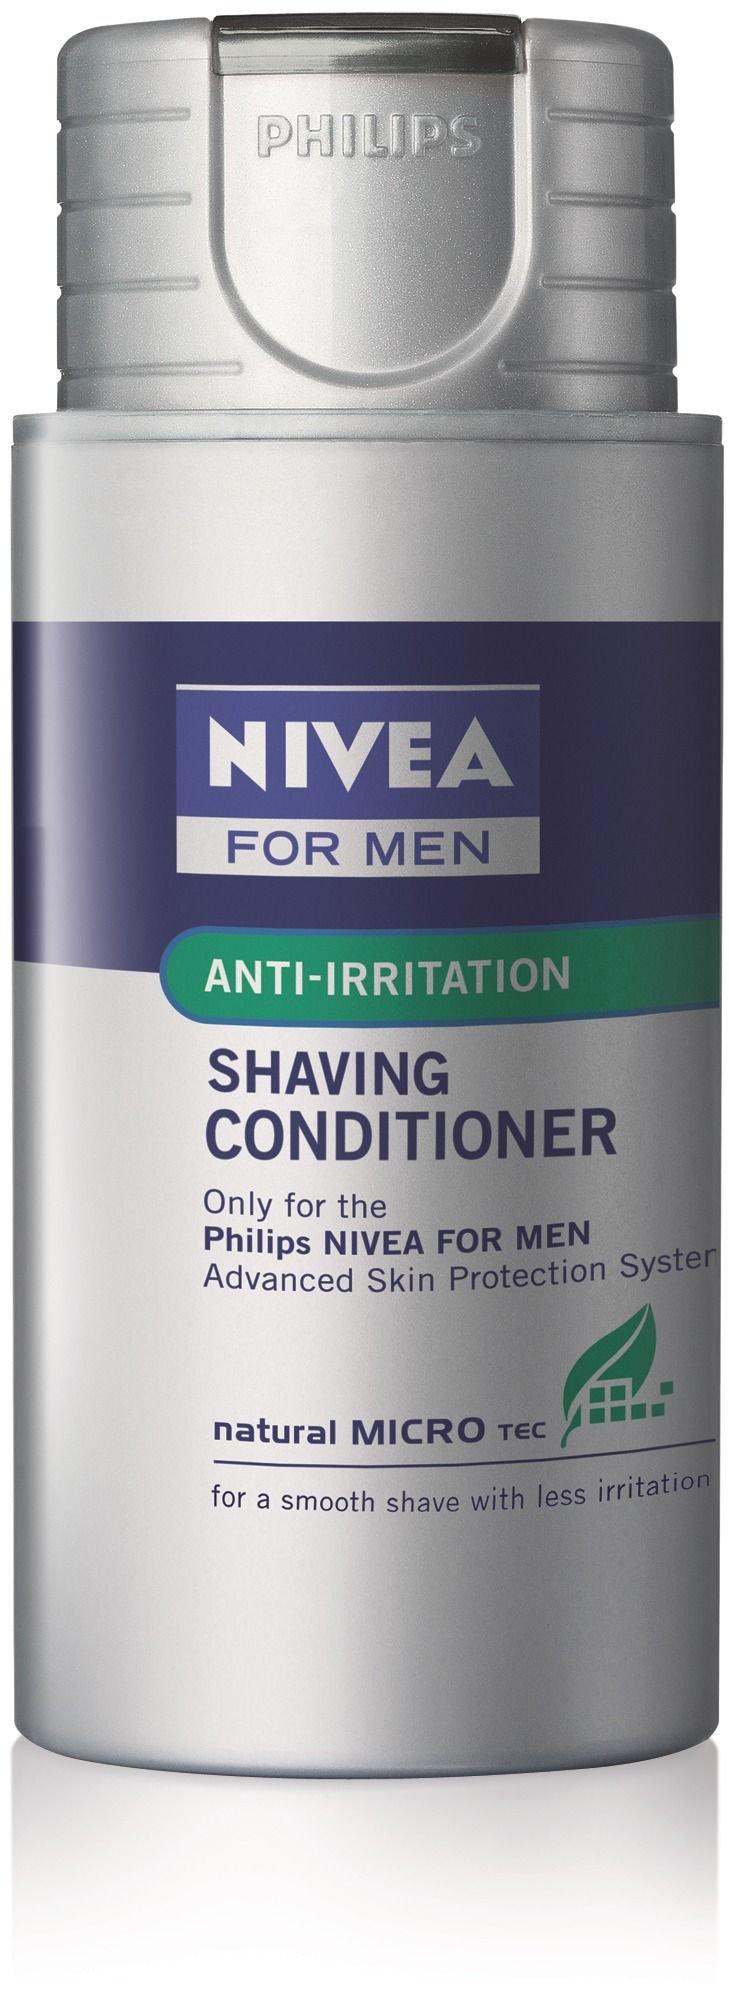 6 X Philips HS800 Nivea Shaving Conditioner Moisturising Balm For Men